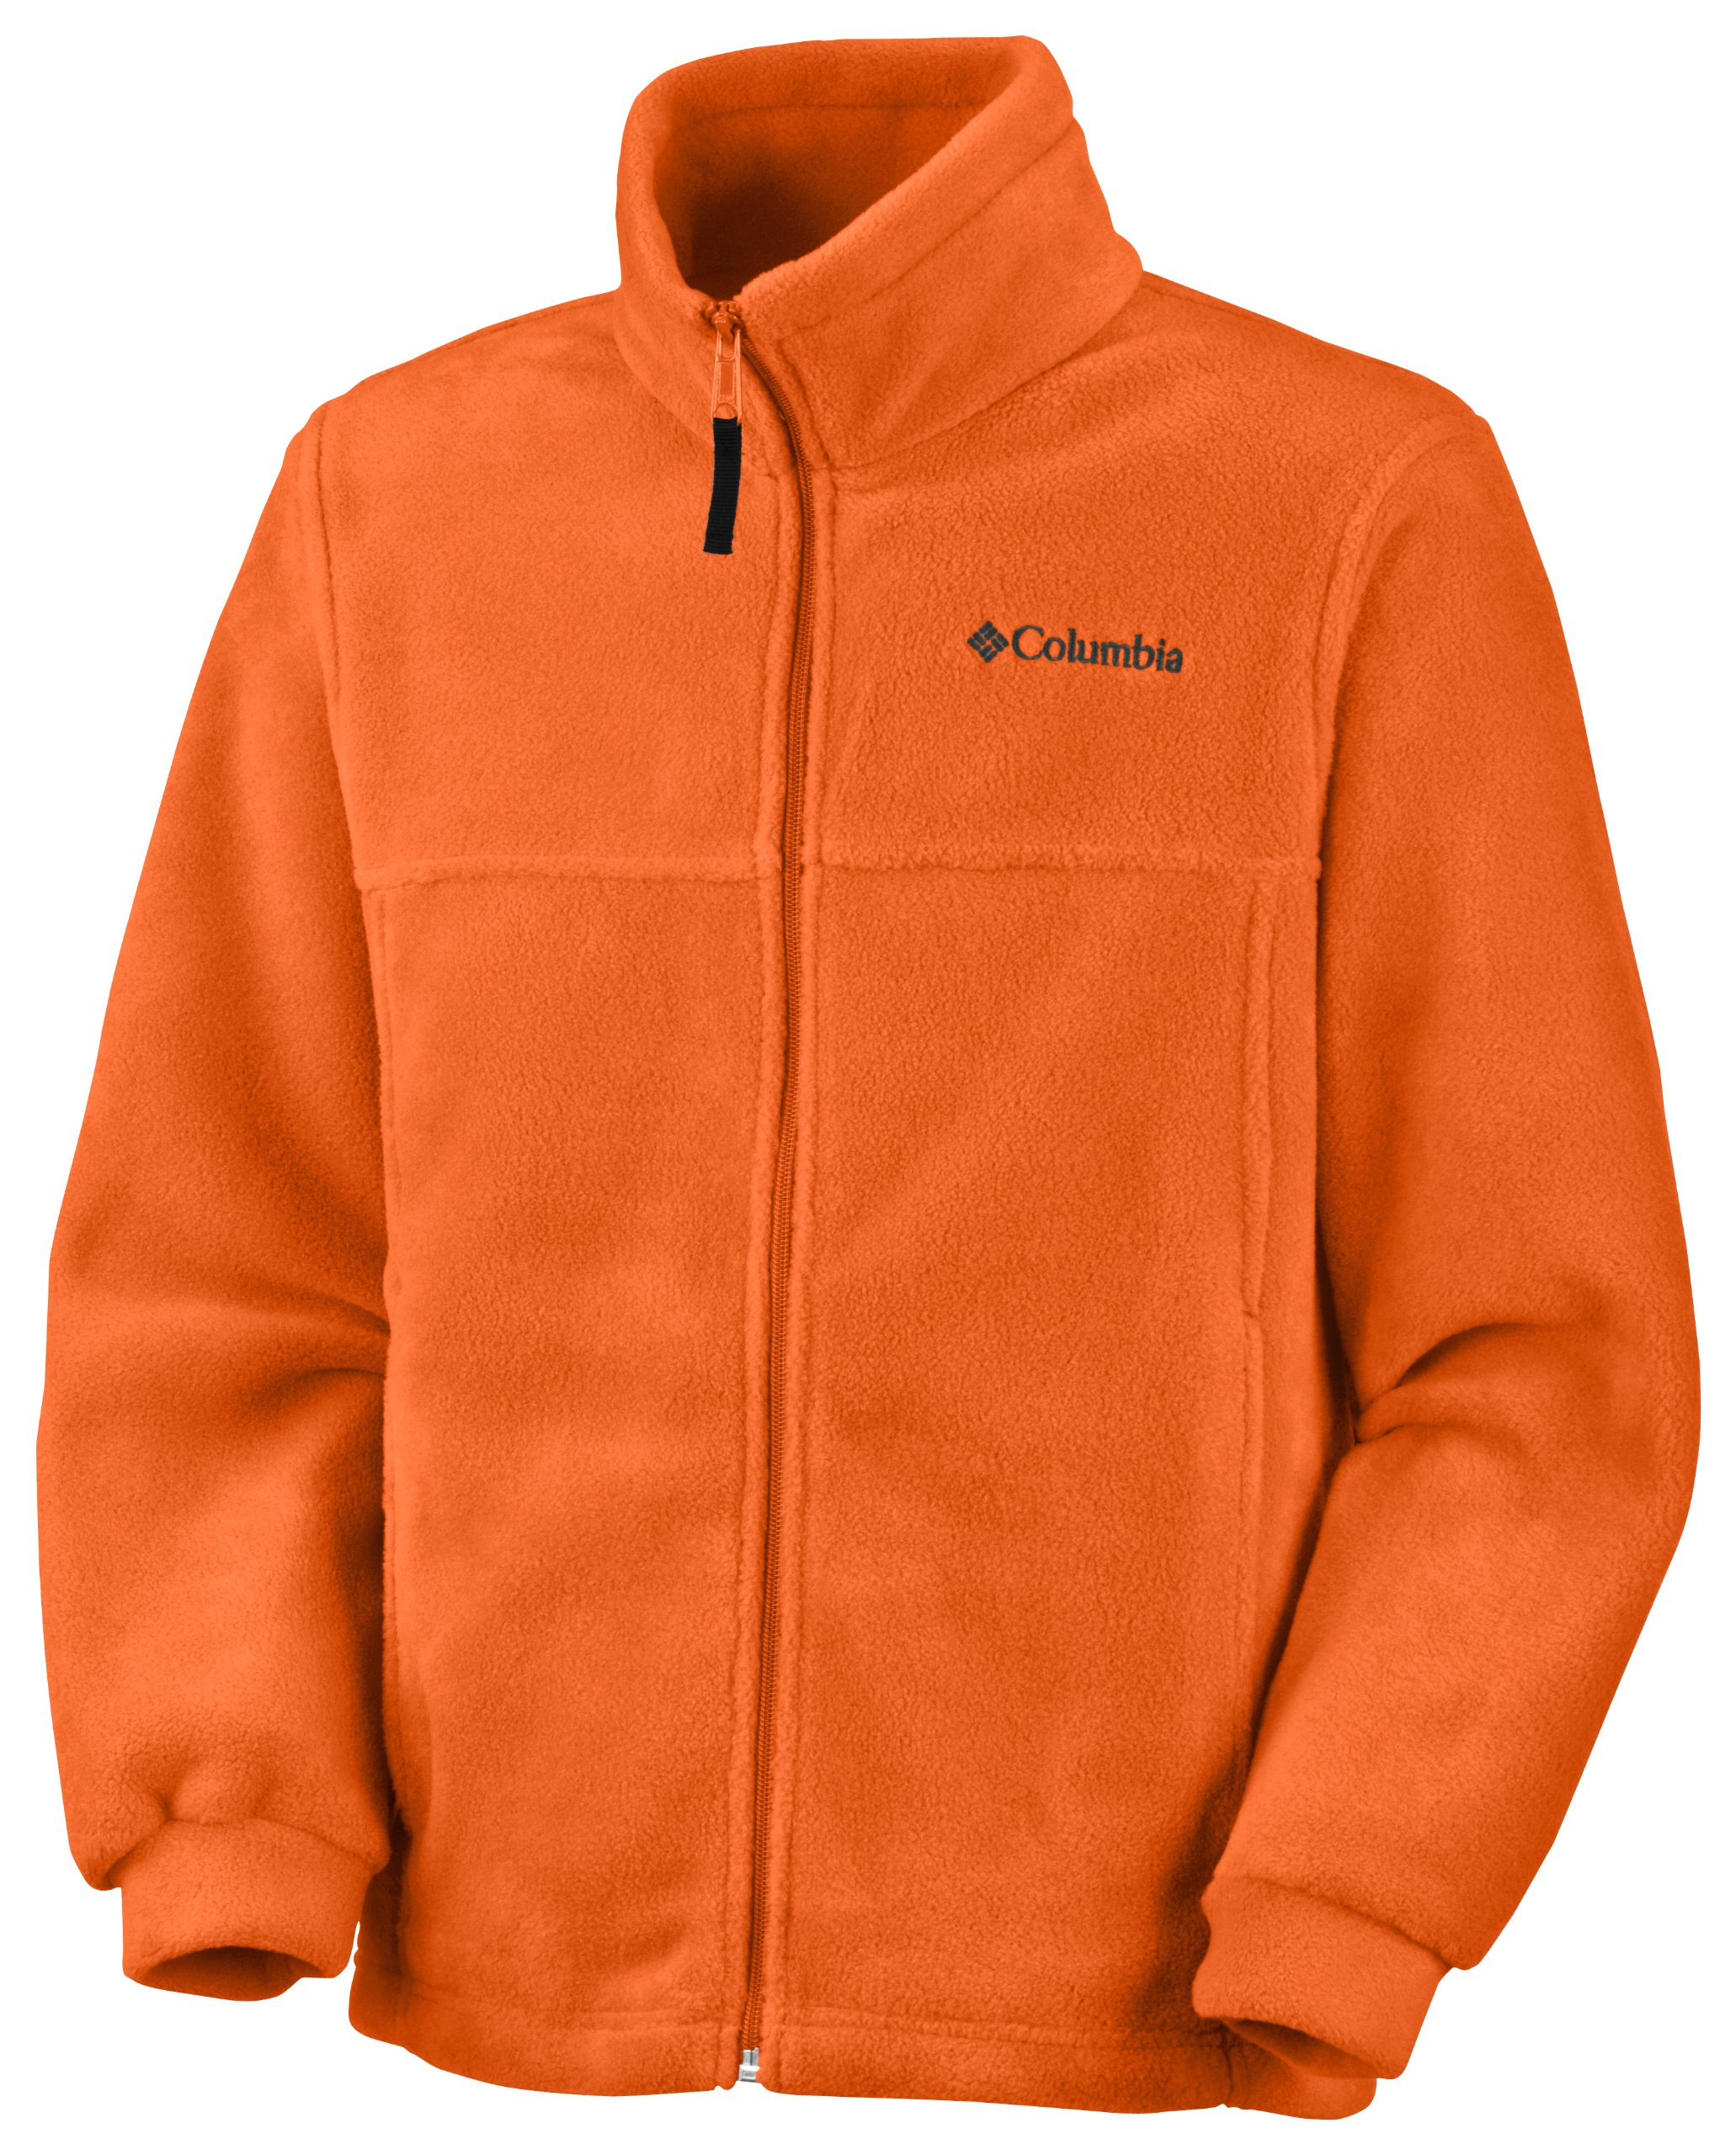 Columbia Steens Mountain Fleece Jacket - Boys' Heatwave, 14/16